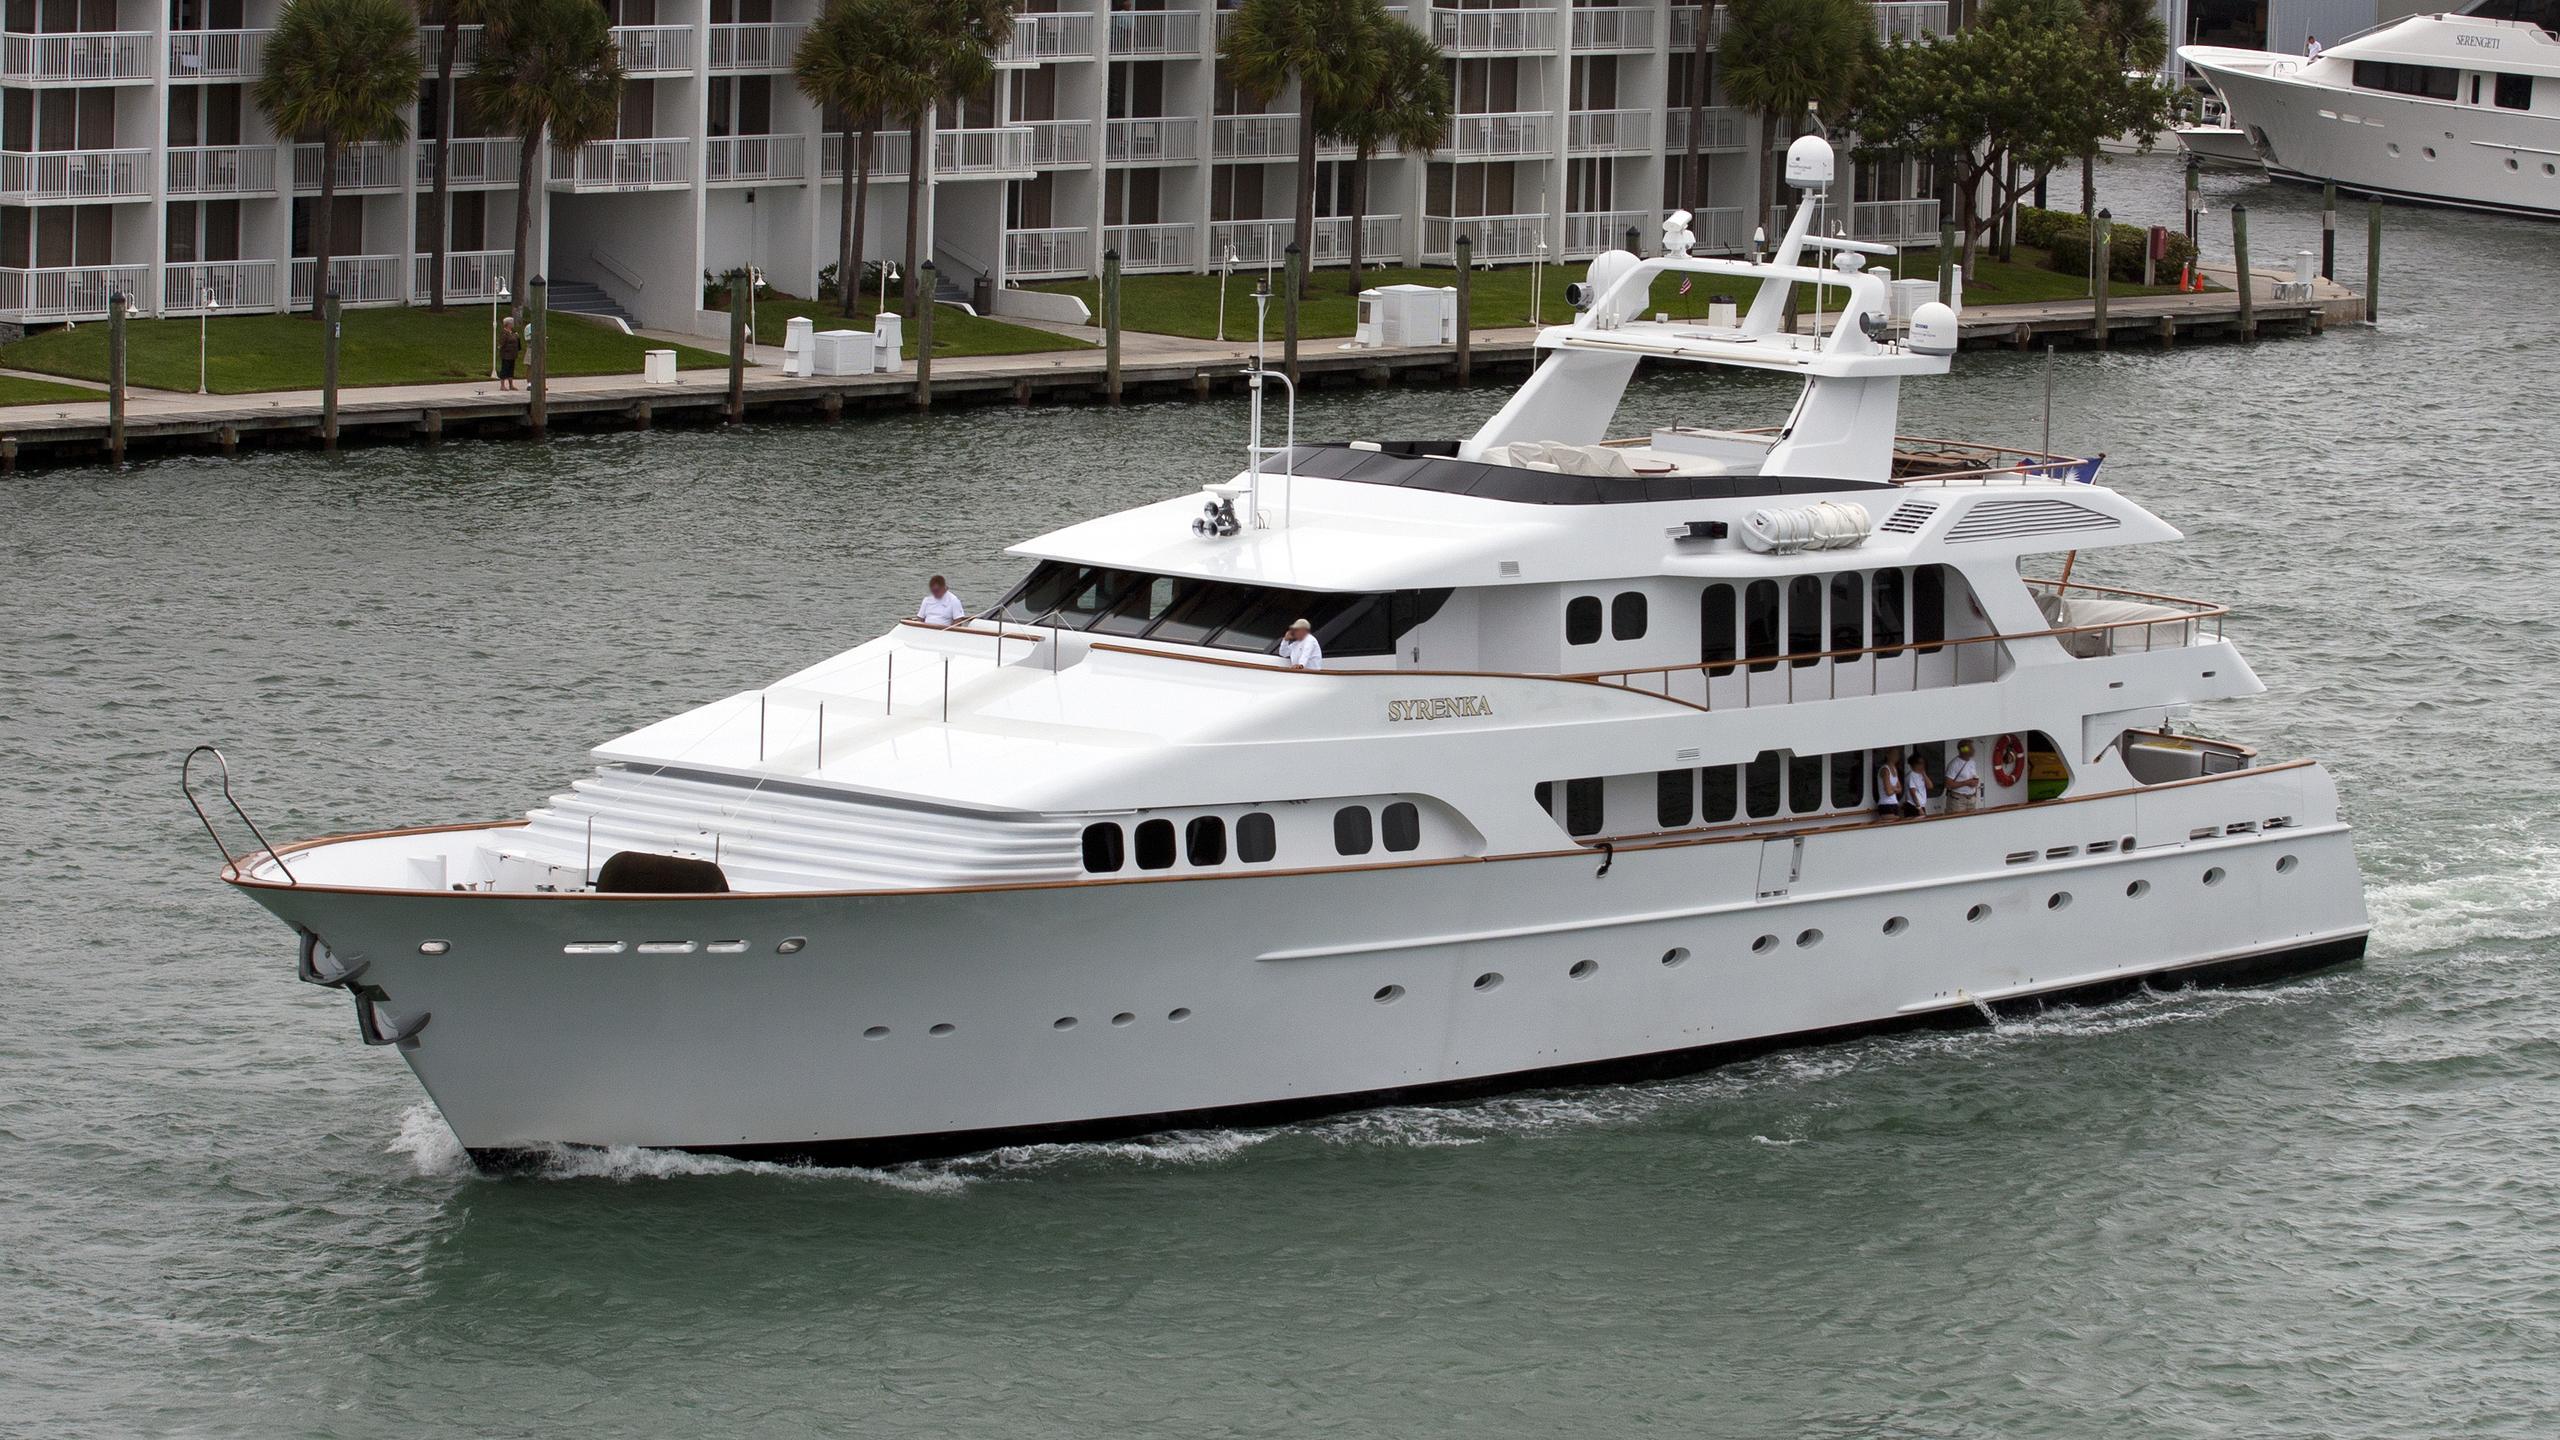 grand illusion syrenka motoryacht palmer johnson 1994 44m cruising half profile